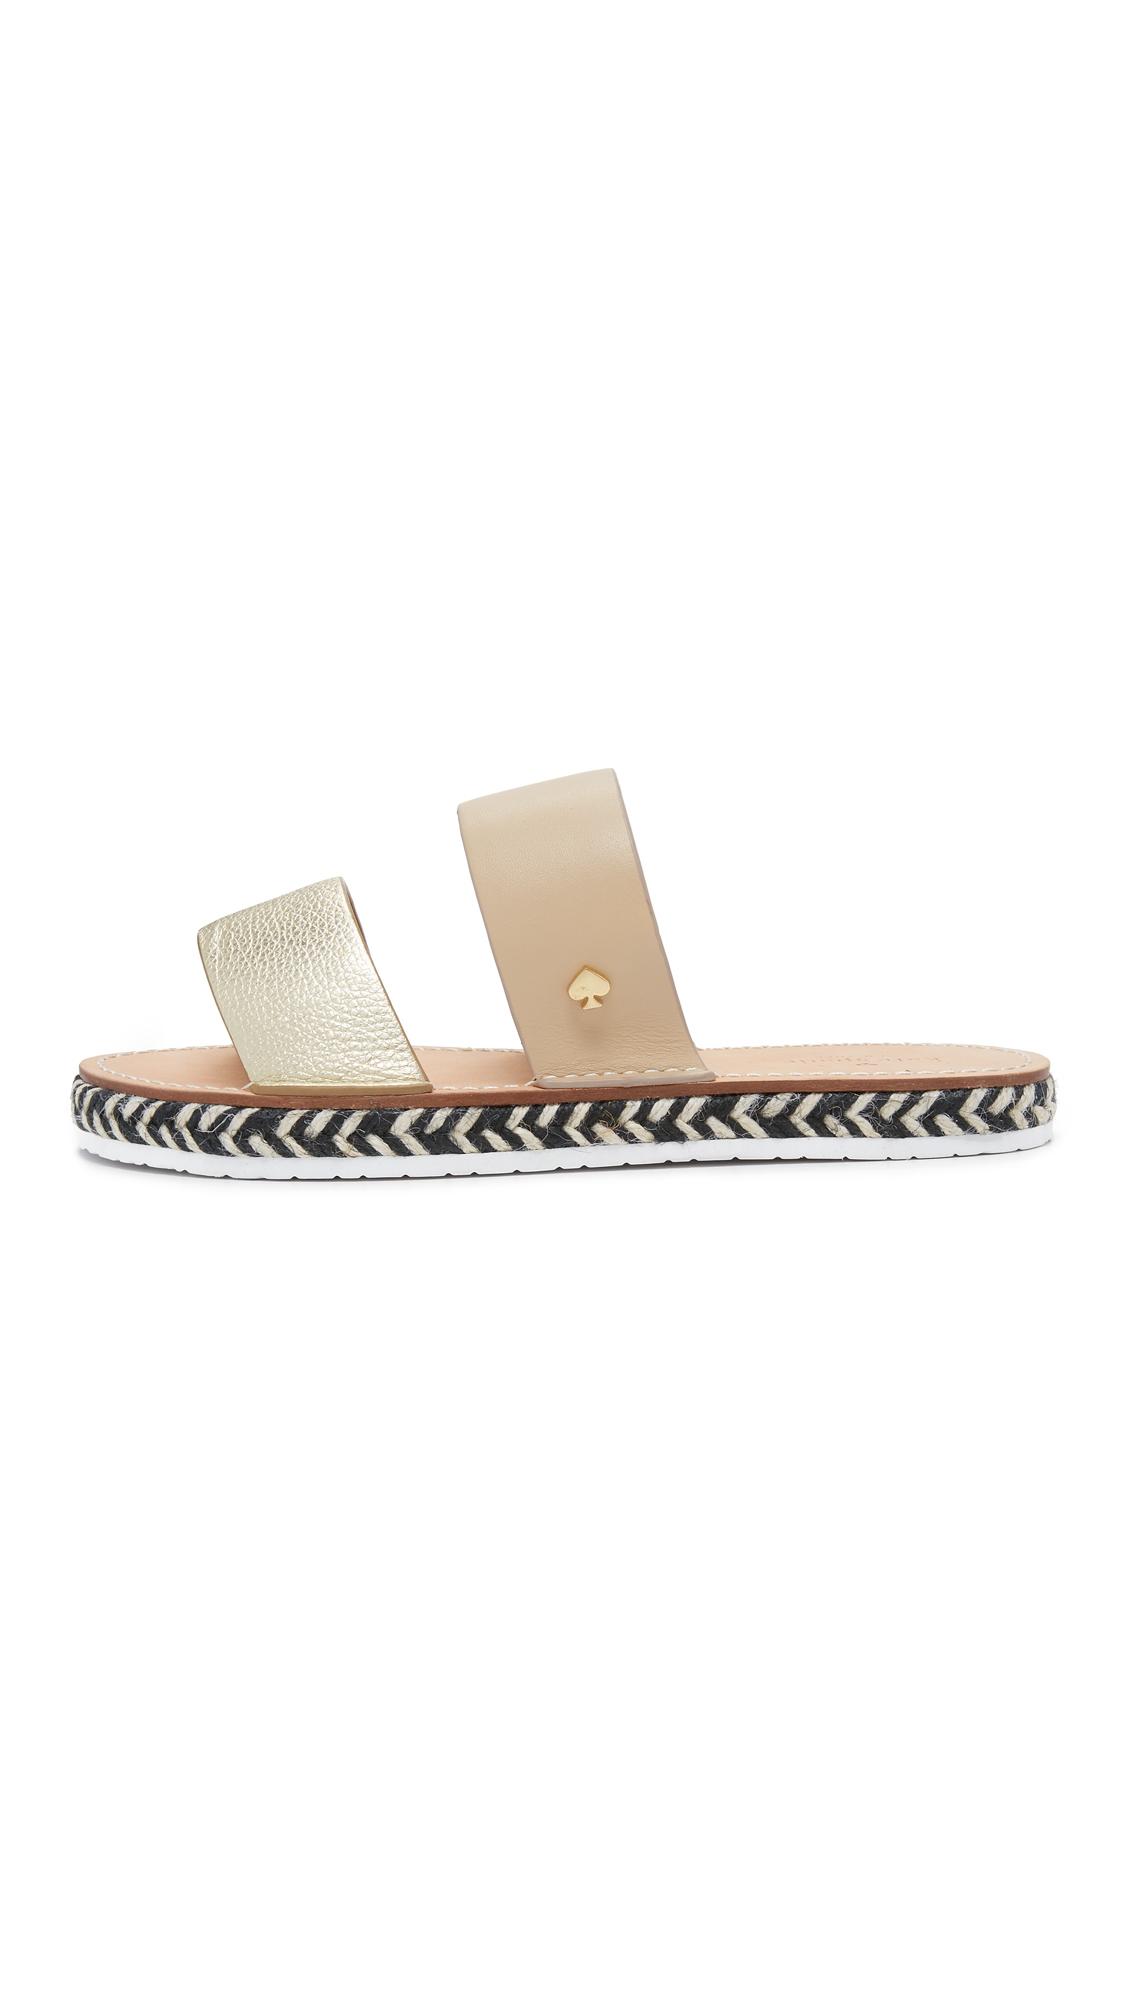 Kate spade new york Idreena Slide Sandals in Black | Lyst